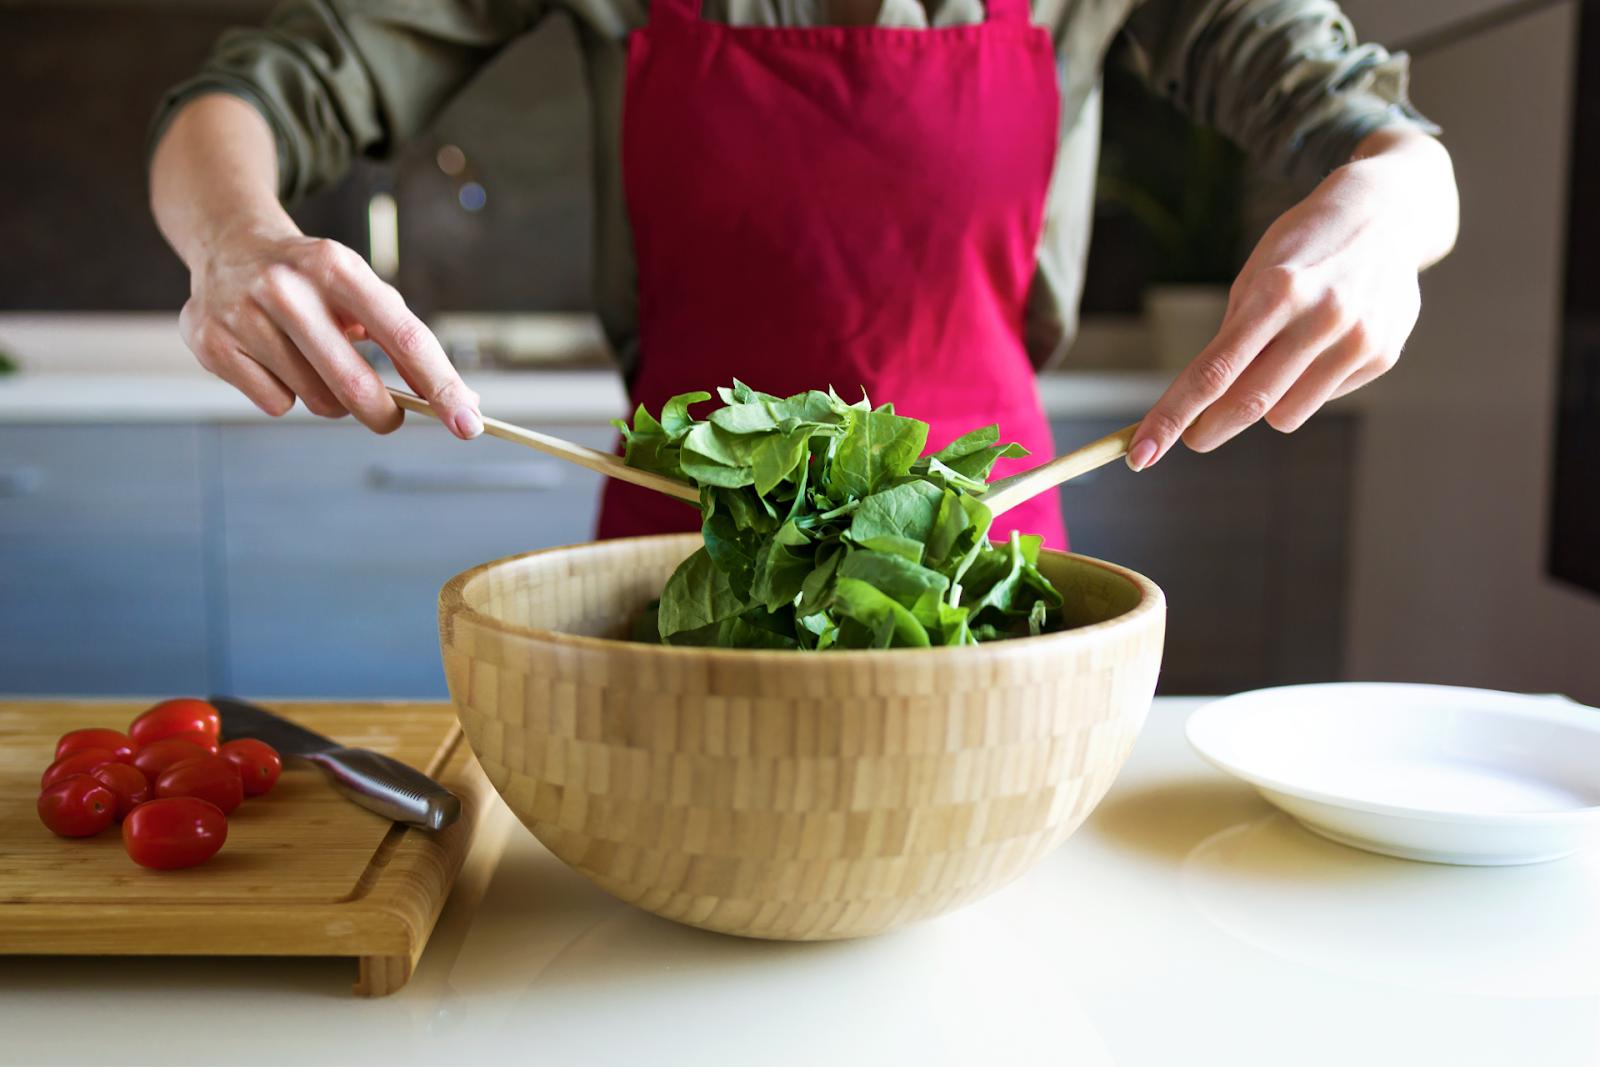 person preparing a salad